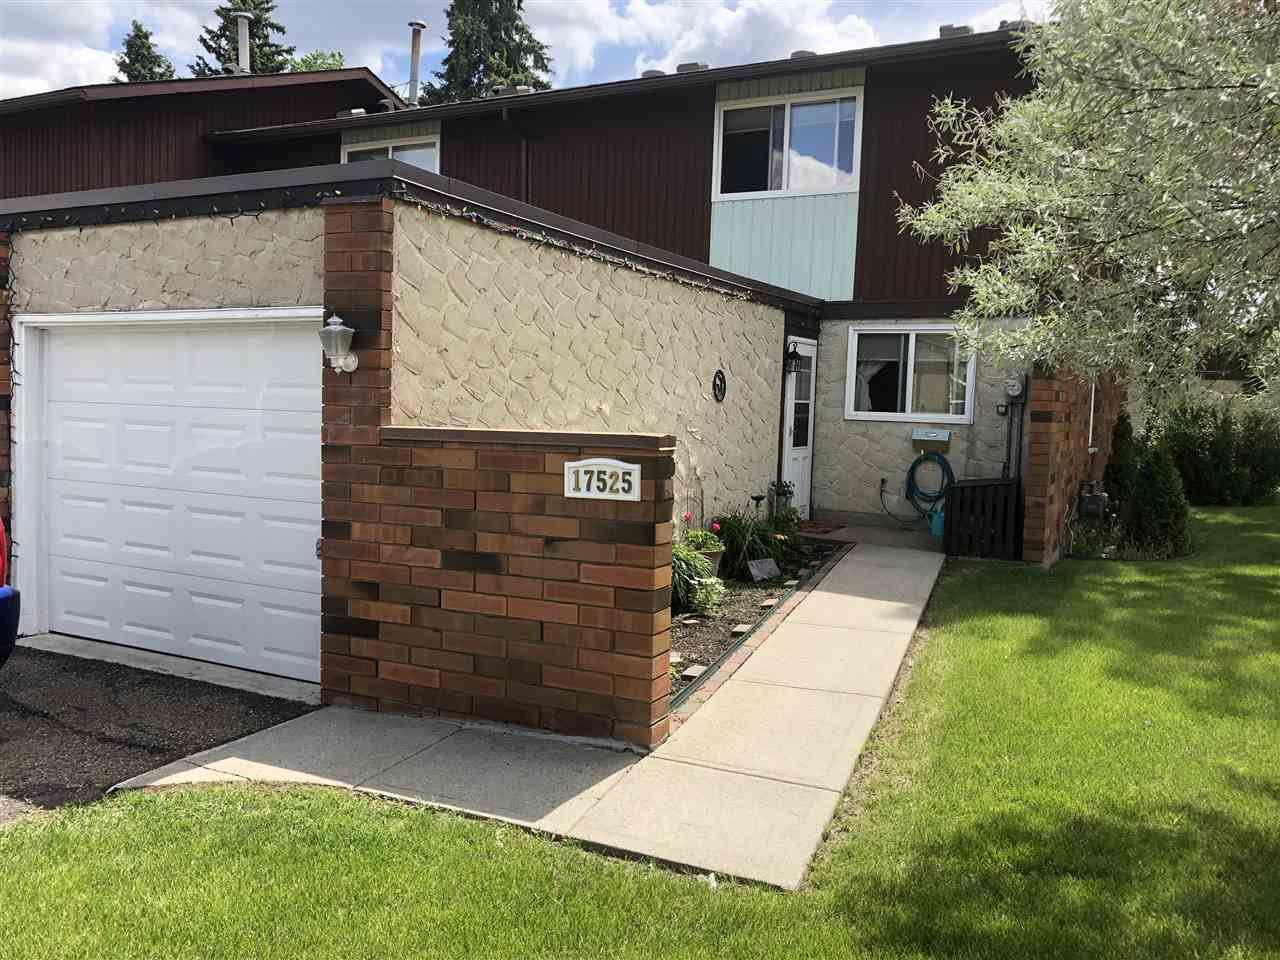 Main Photo: 17525 77 Avenue in Edmonton: Zone 20 Townhouse for sale : MLS®# E4166599